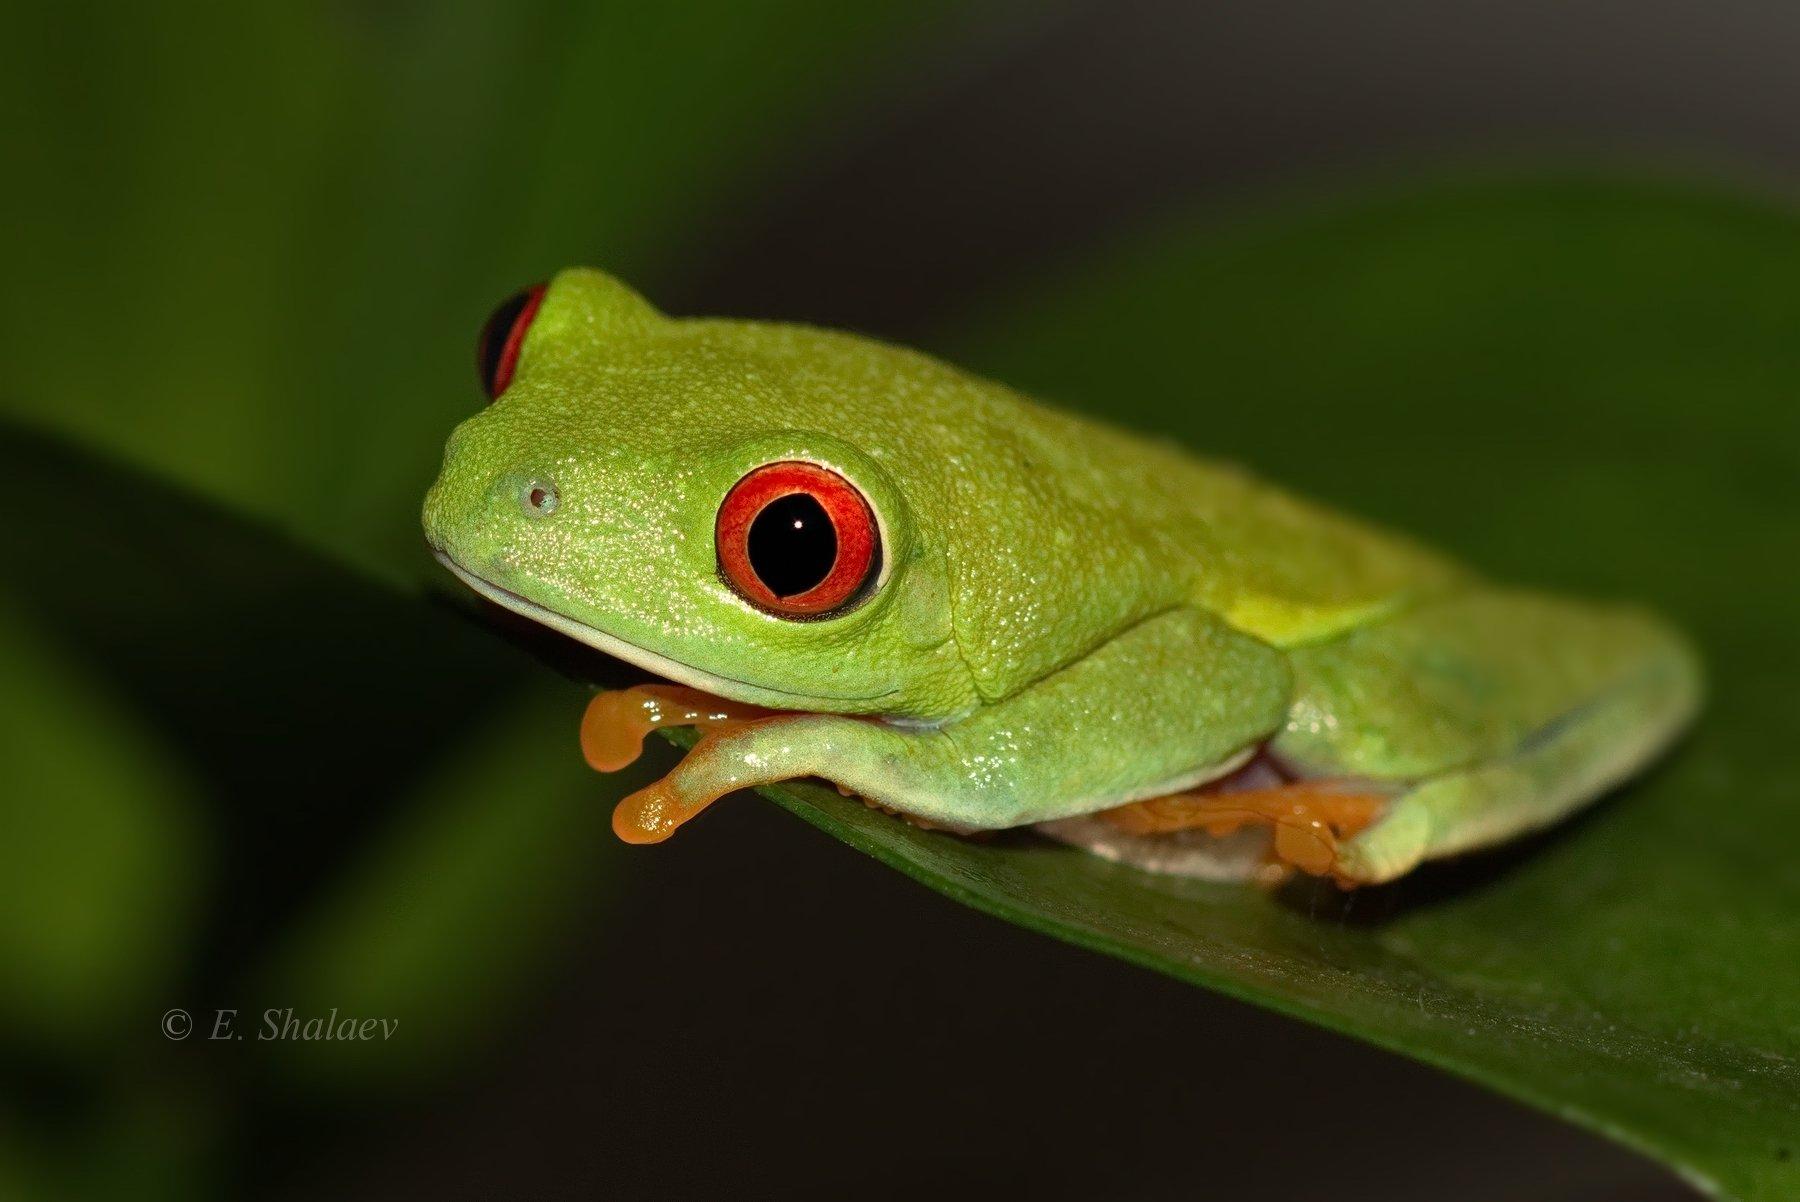 agalychnis callidryas,frog,red-eyed tree frog,амфибии,квакша,красноглазая квакша,лягушка, Евгений